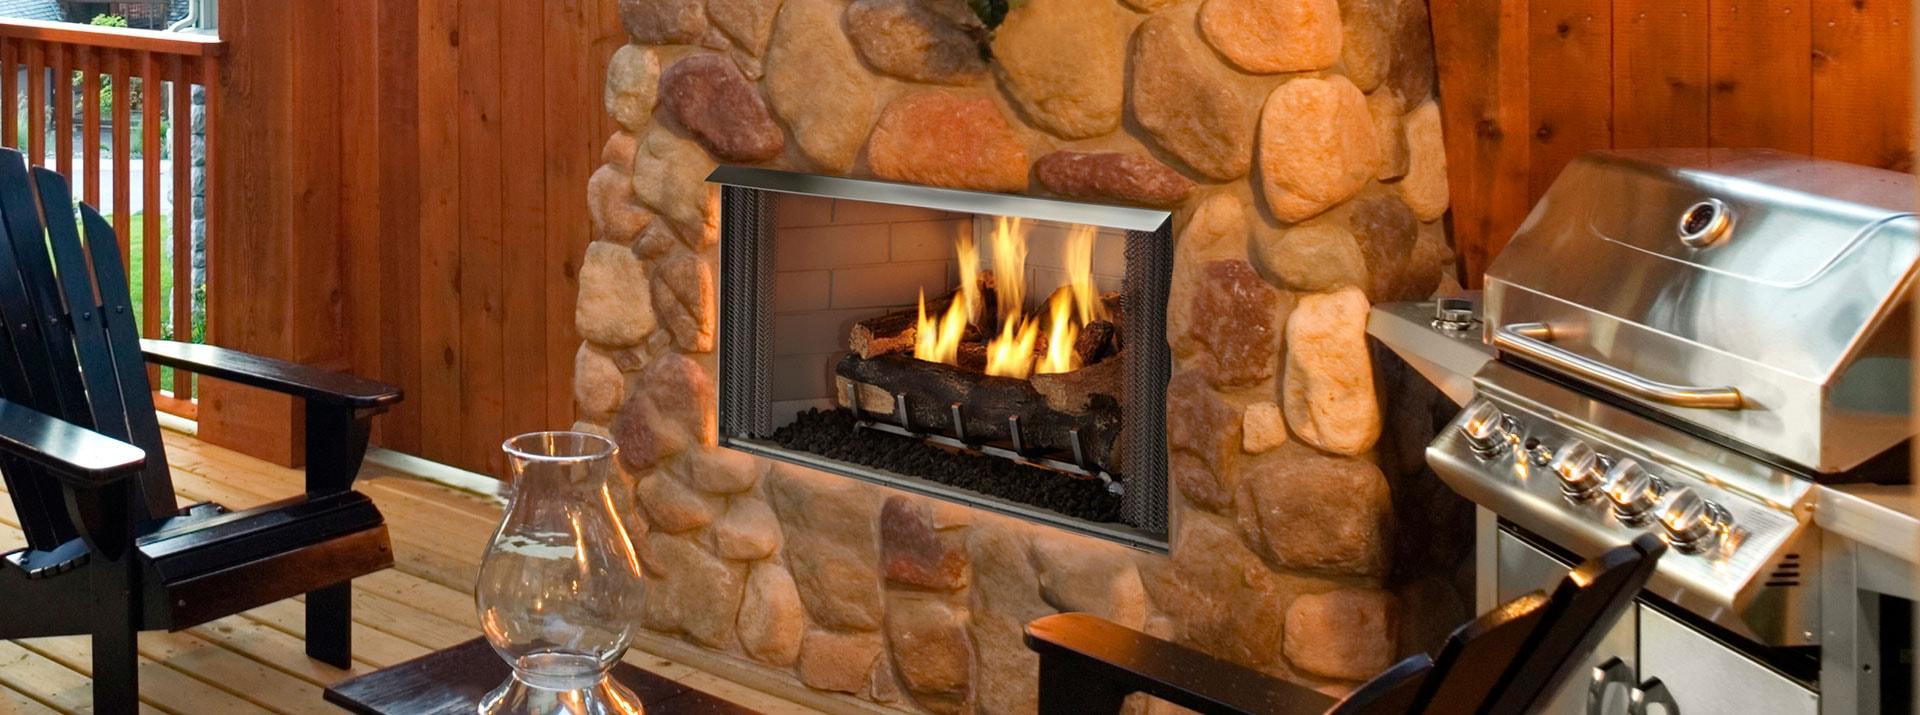 Fireplace Xtrordinair Prices Luxury Outdoor Lifestyles Villa Gas Pact Outdoor Fireplace